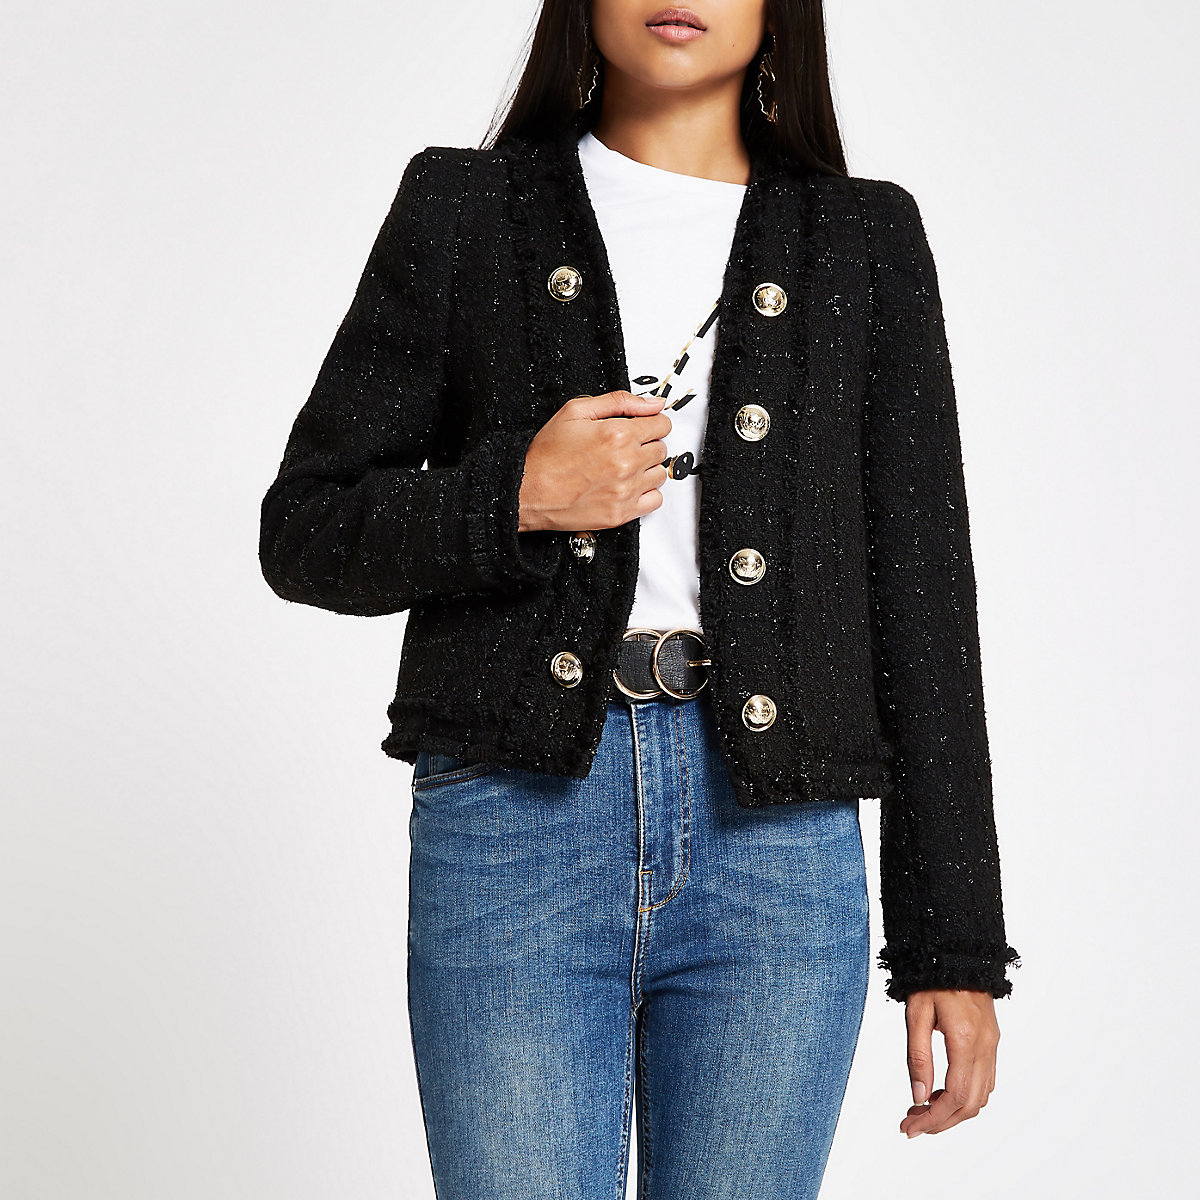 Petite black boucle jacket